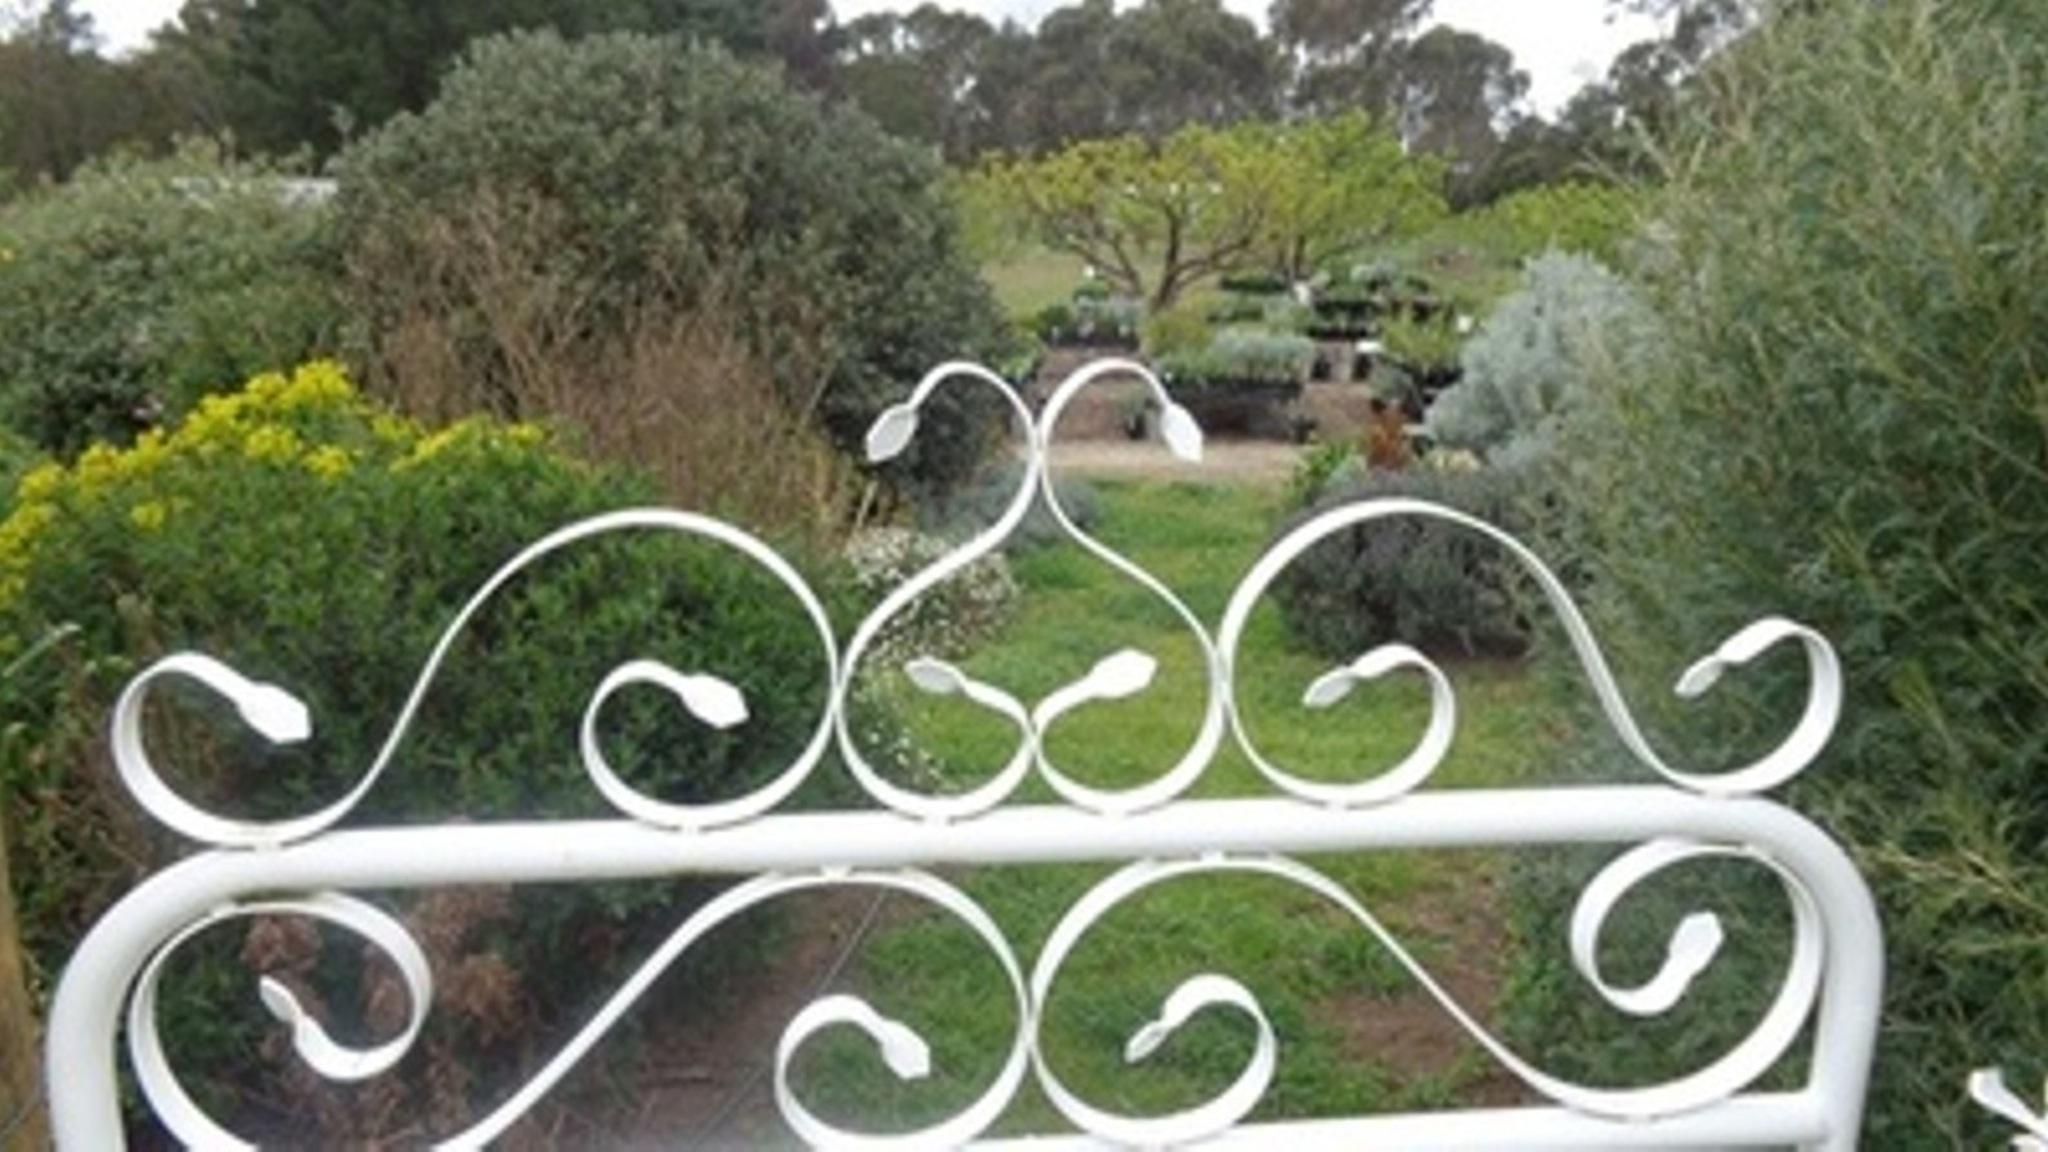 Garden Gate of InverleighGarden Gate of Inverleigh  Attraction  Geelong   the Bellarine  . Garden Stores Geelong. Home Design Ideas